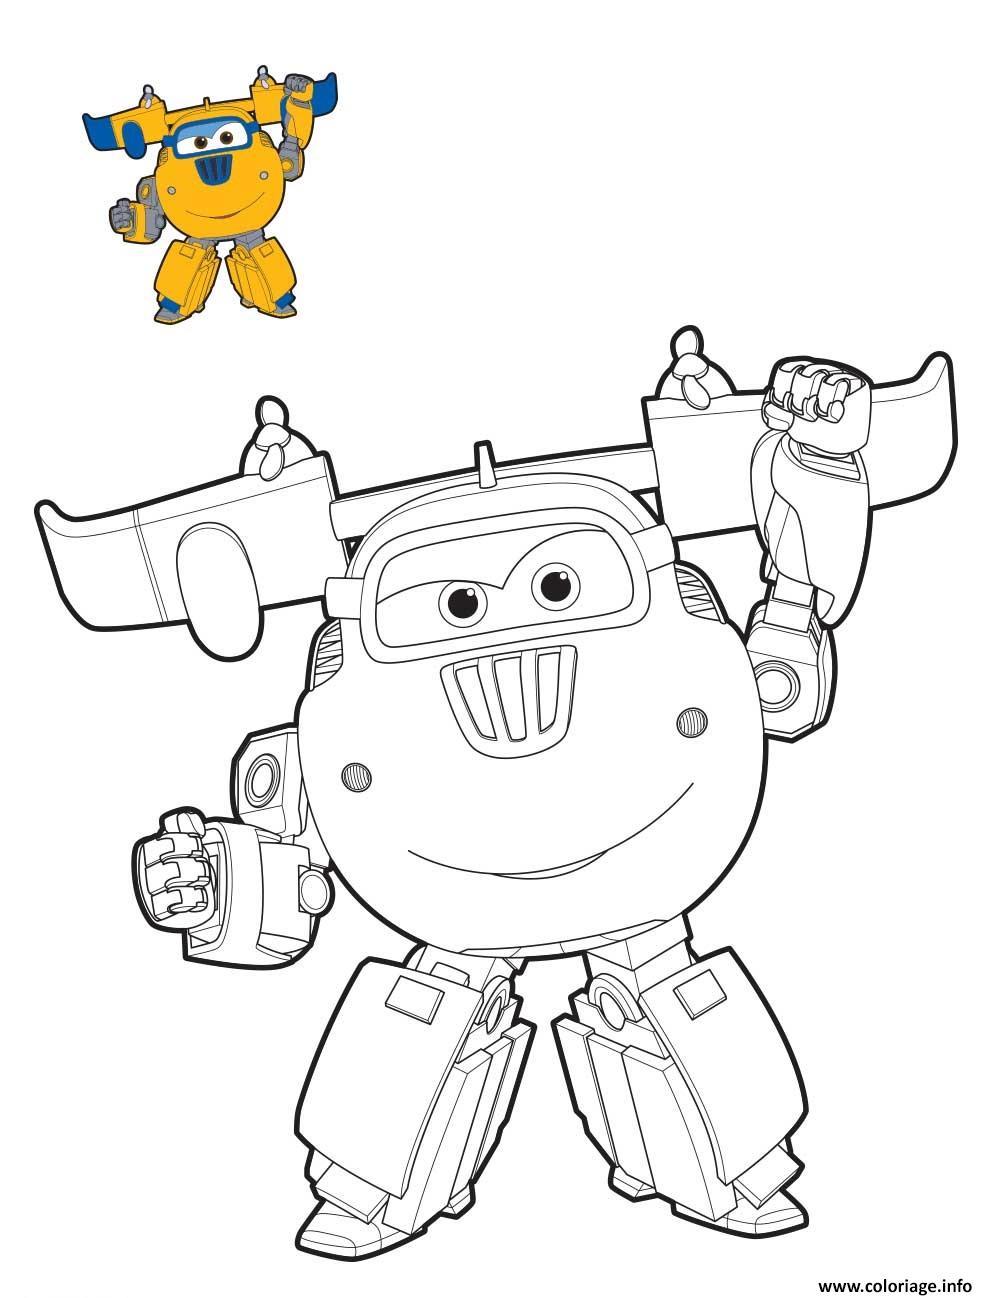 Coloriage super wings donnie mode robot dessin - Robot coloriage ...